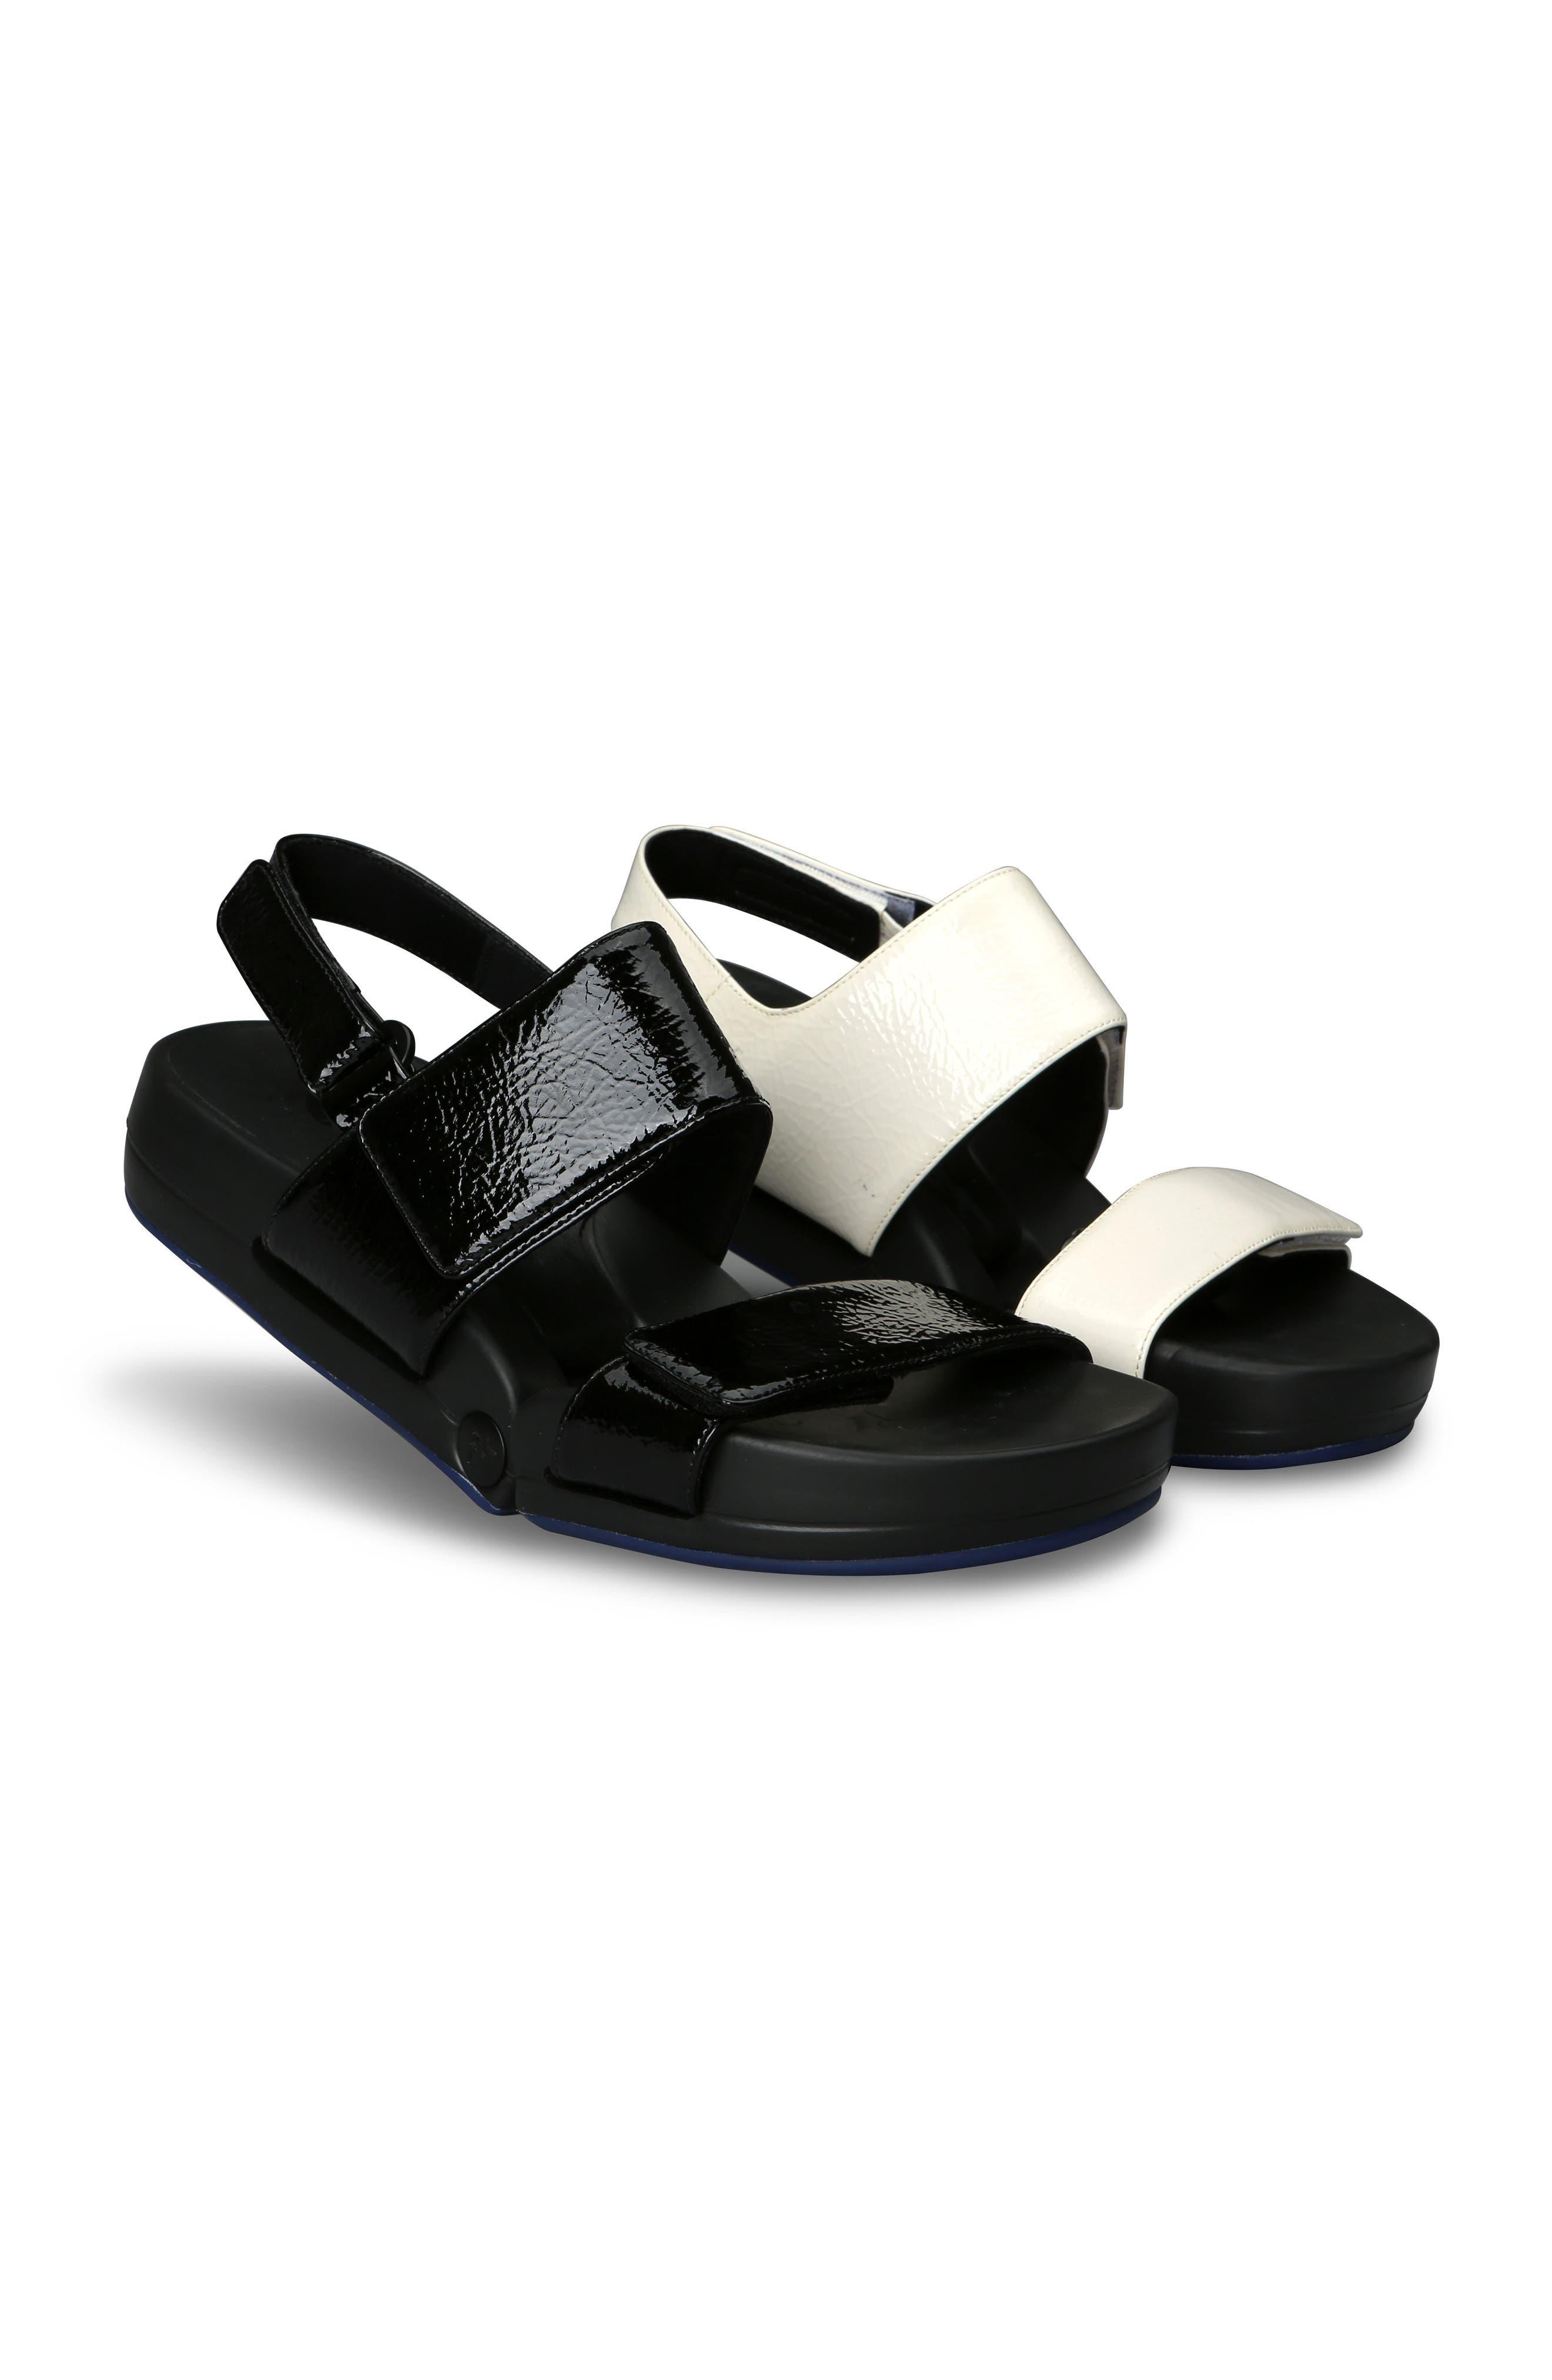 Figulous Sandal,                             Alternate thumbnail 9, color,                             BLACK CRINKLE PATENT LEATHER